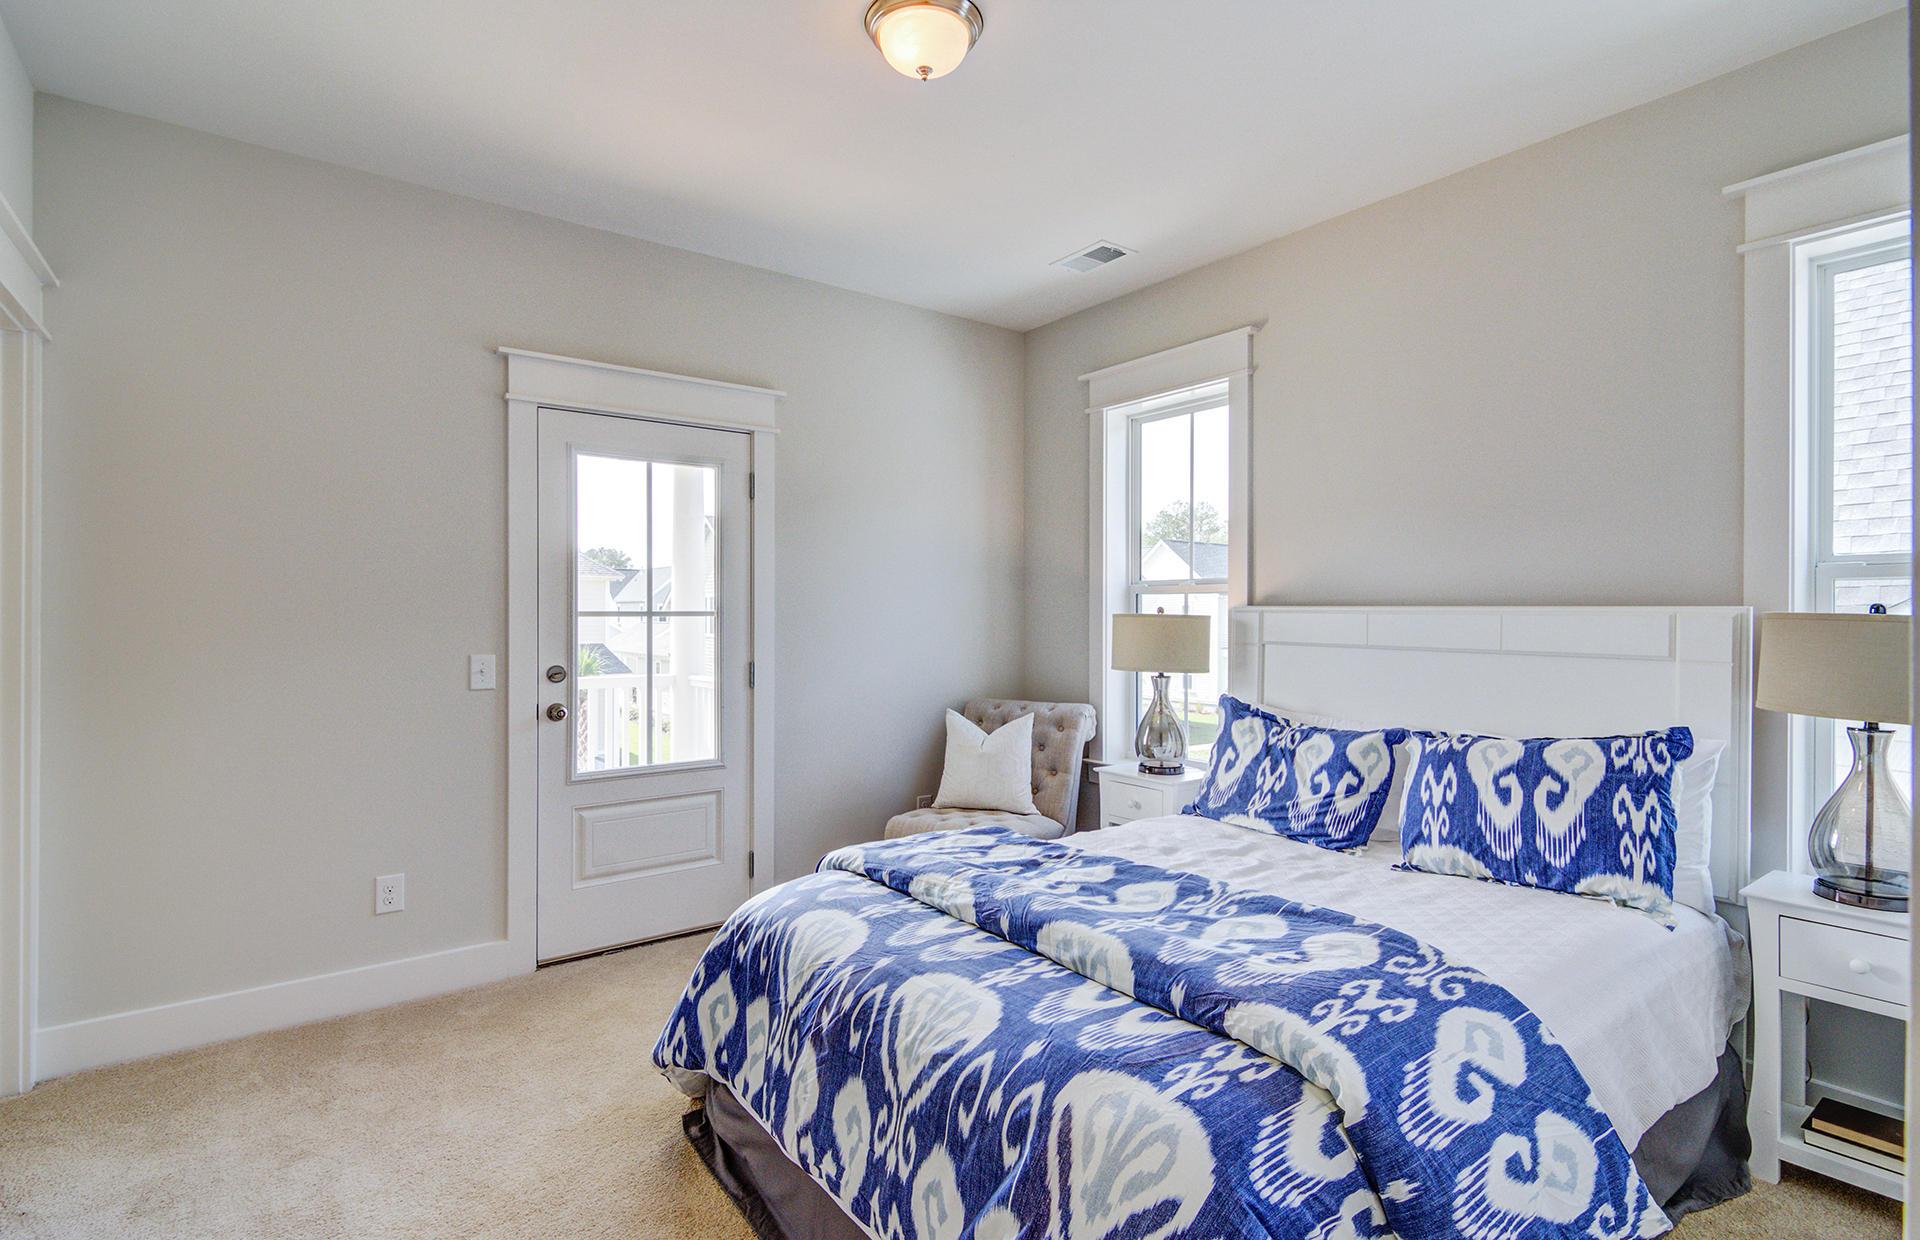 Carolina Park Homes For Sale - 3582 Backshore, Mount Pleasant, SC - 13